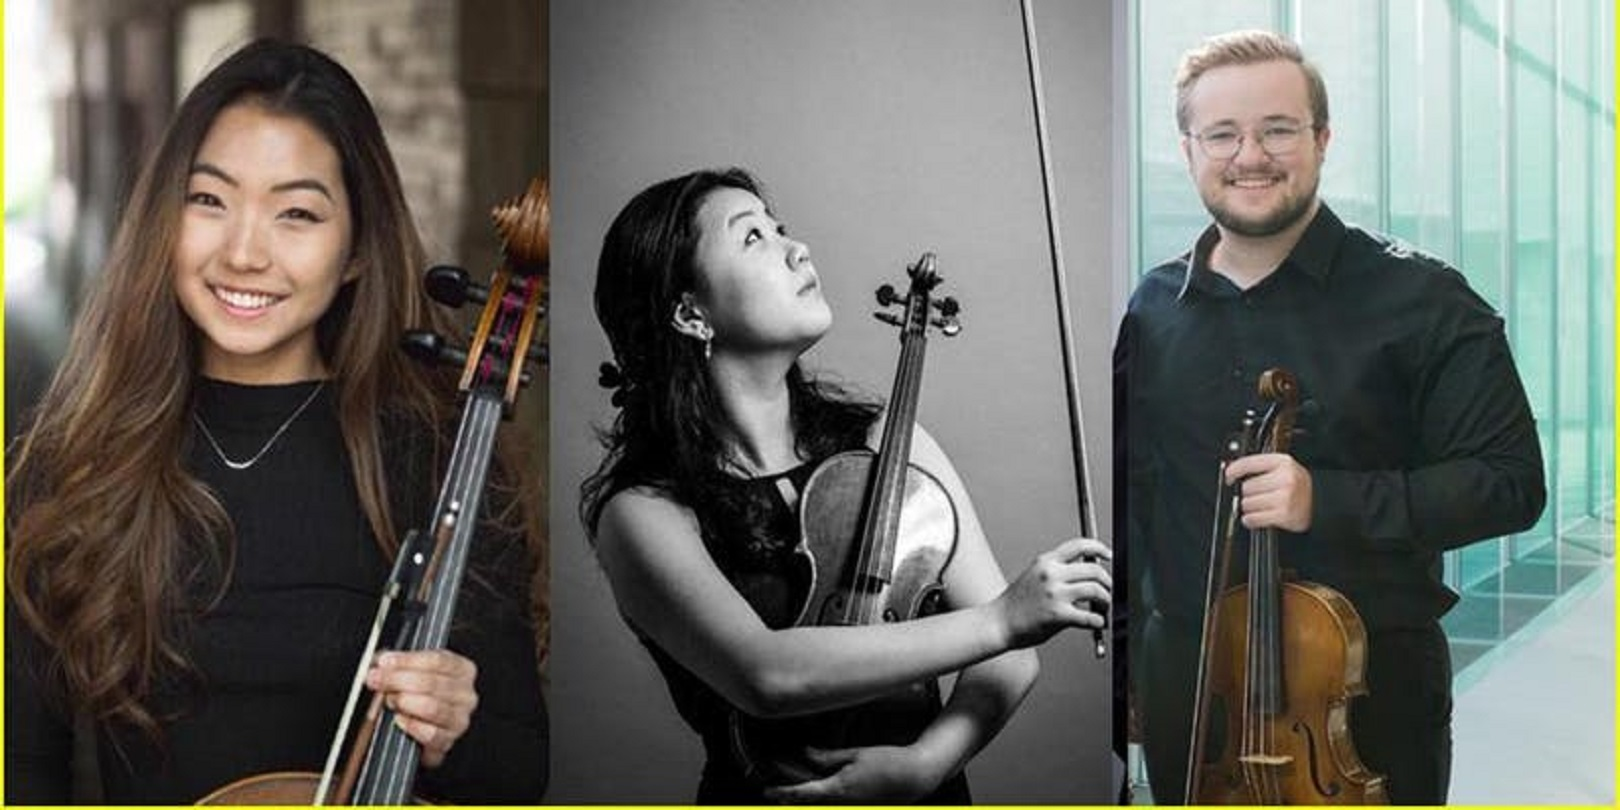 split image with string trio